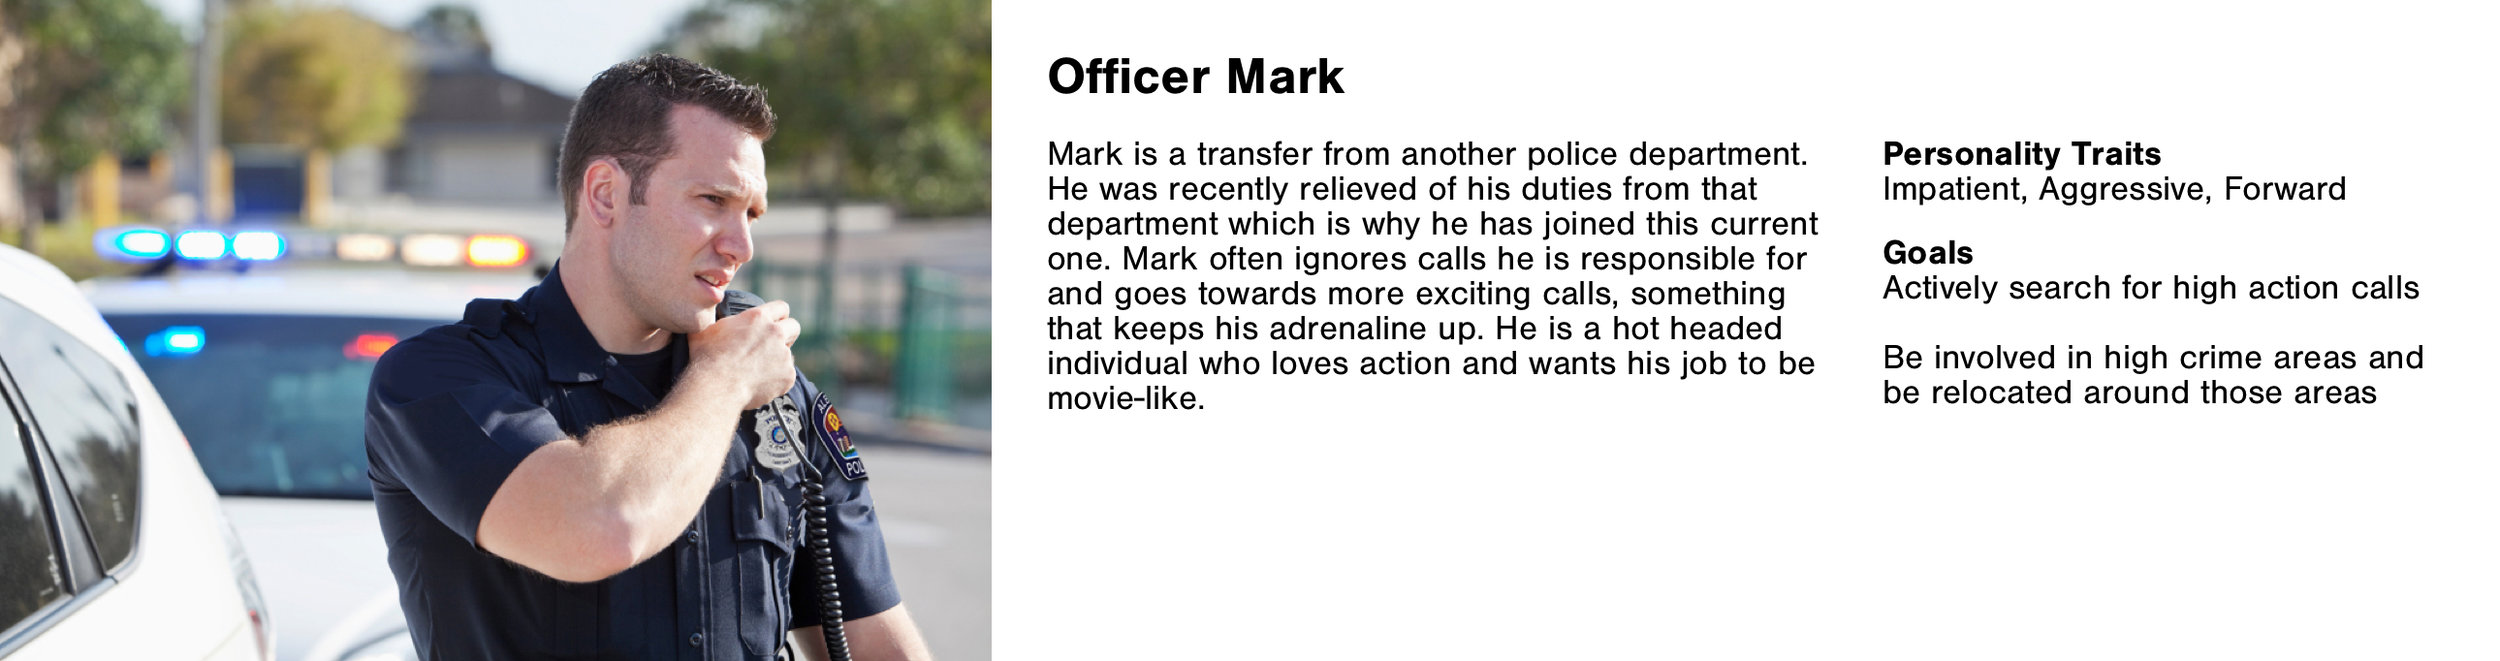 persona_mark.jpg